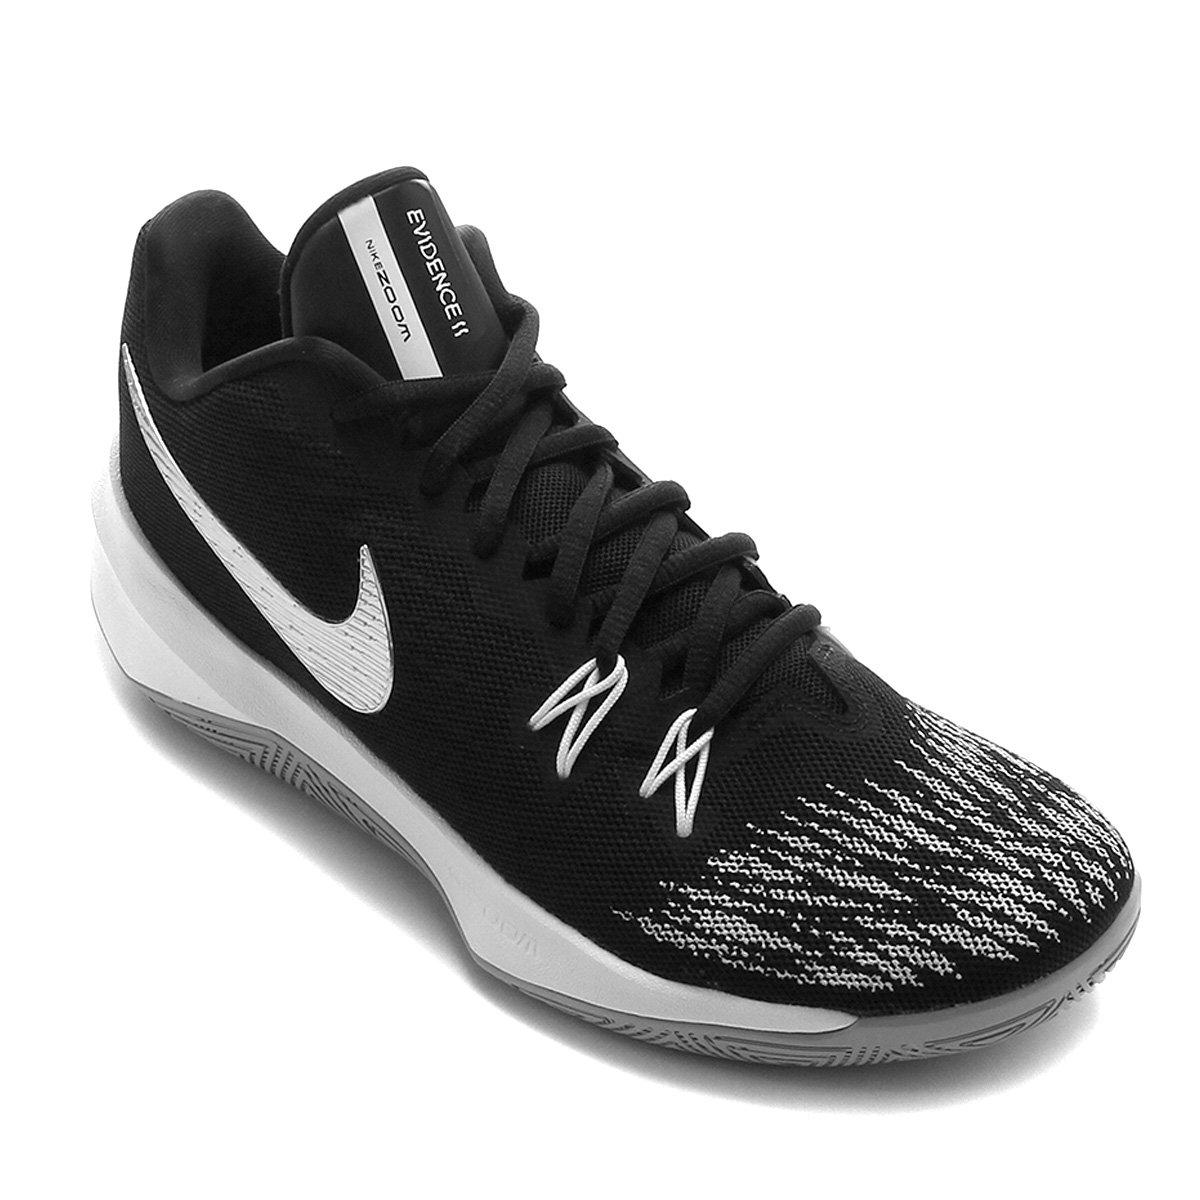 bd0ff6894eda Tênis Nike Zoom Evidence II Masculino - Preto e Cinza - Compre Agora ...